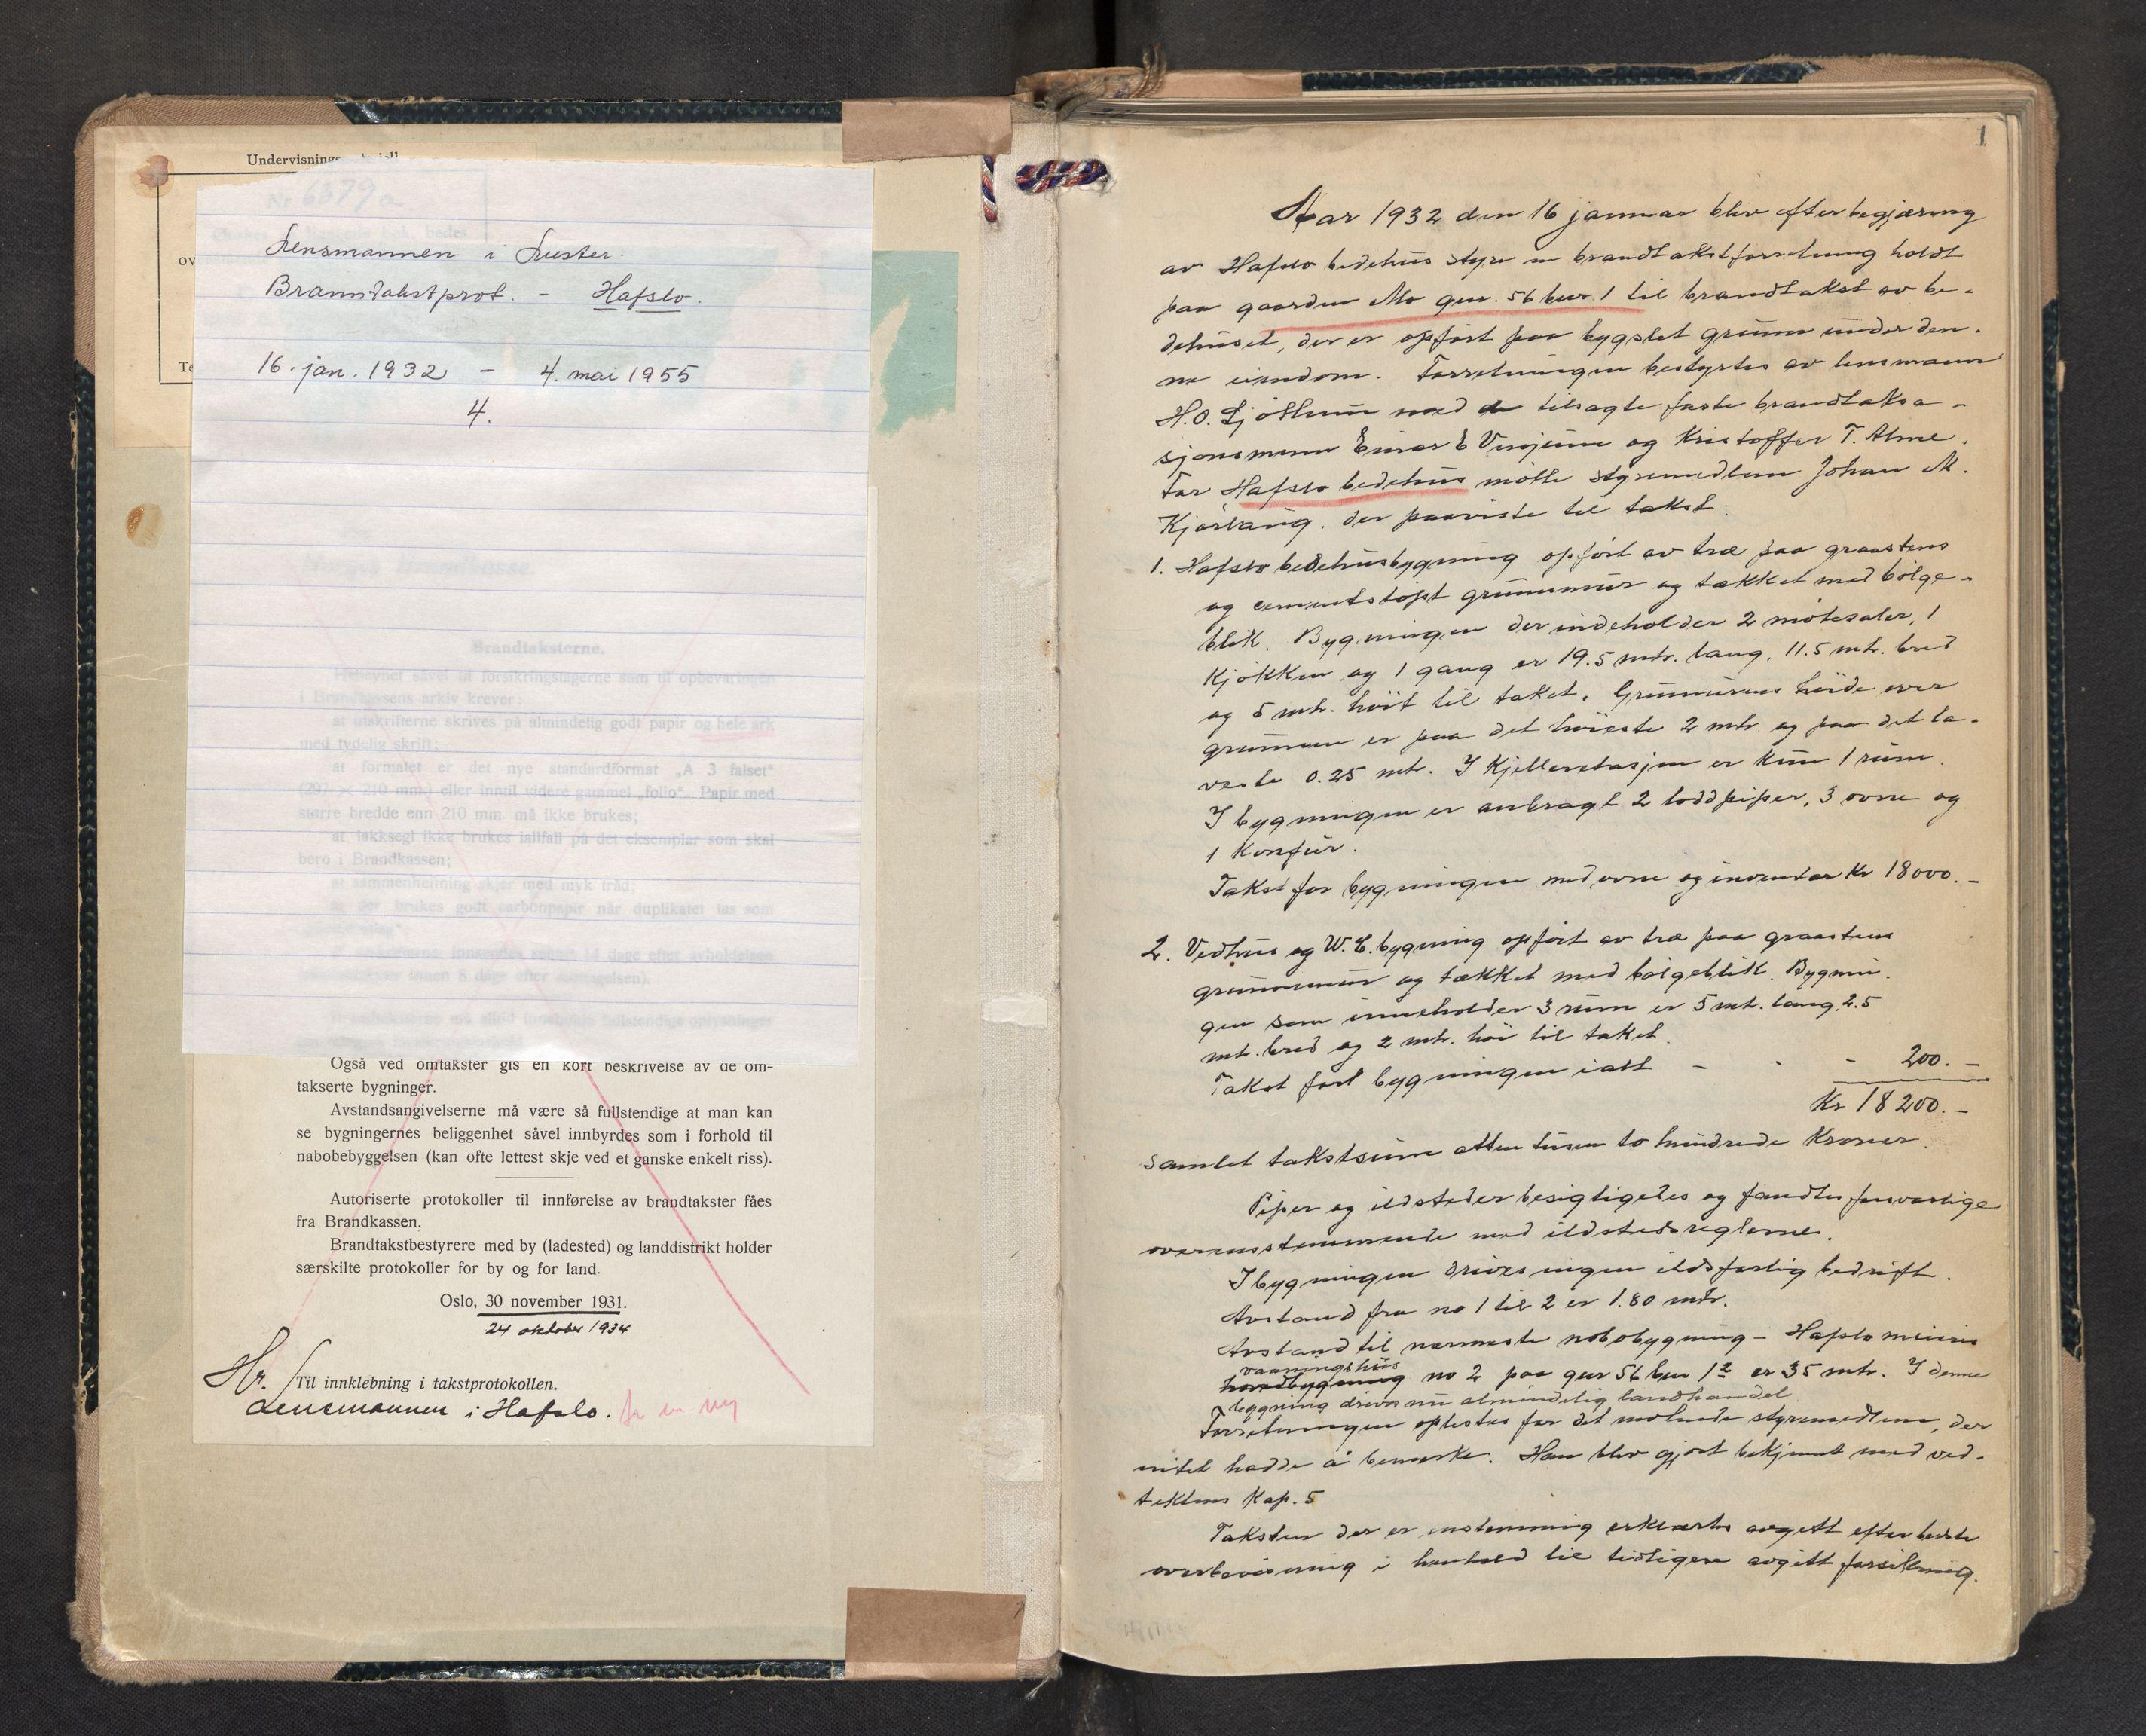 SAB, Lensmannen i Hafslo, 0012/L0004: Branntakstprotokoll, 1932-1955, s. 1a